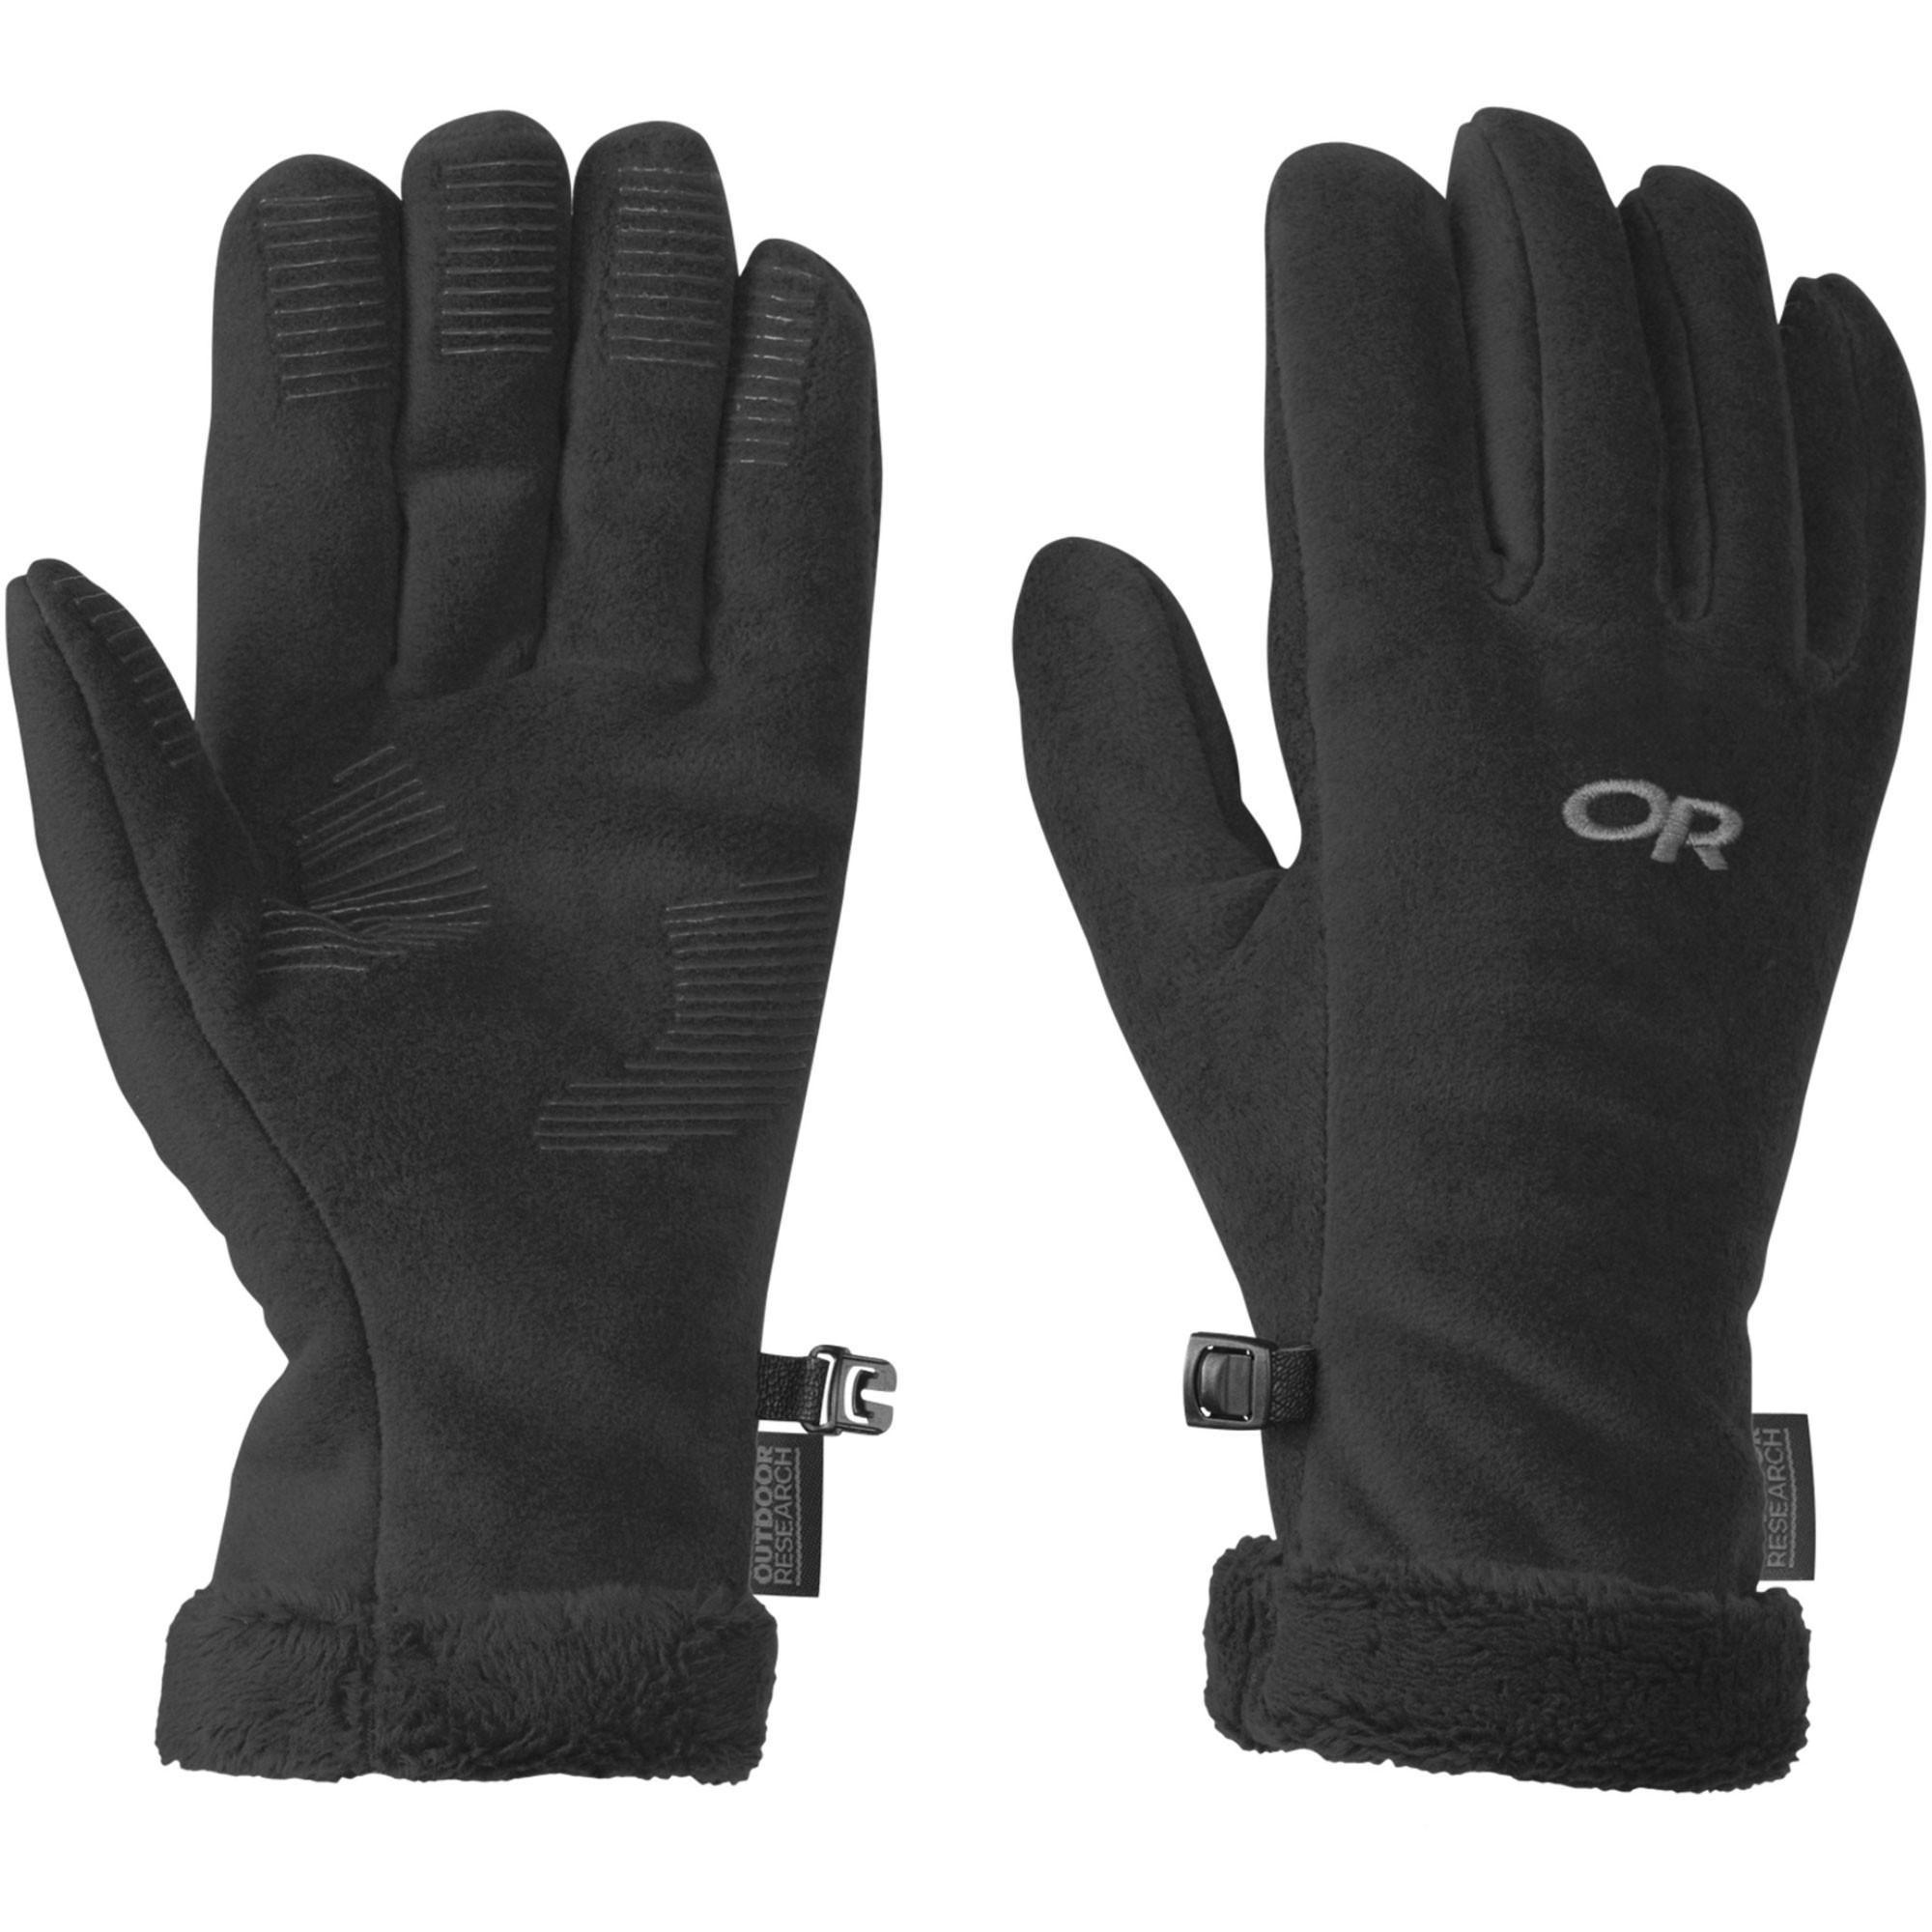 Outdoor Research Fuzzy Sensor Women's Gloves - Black